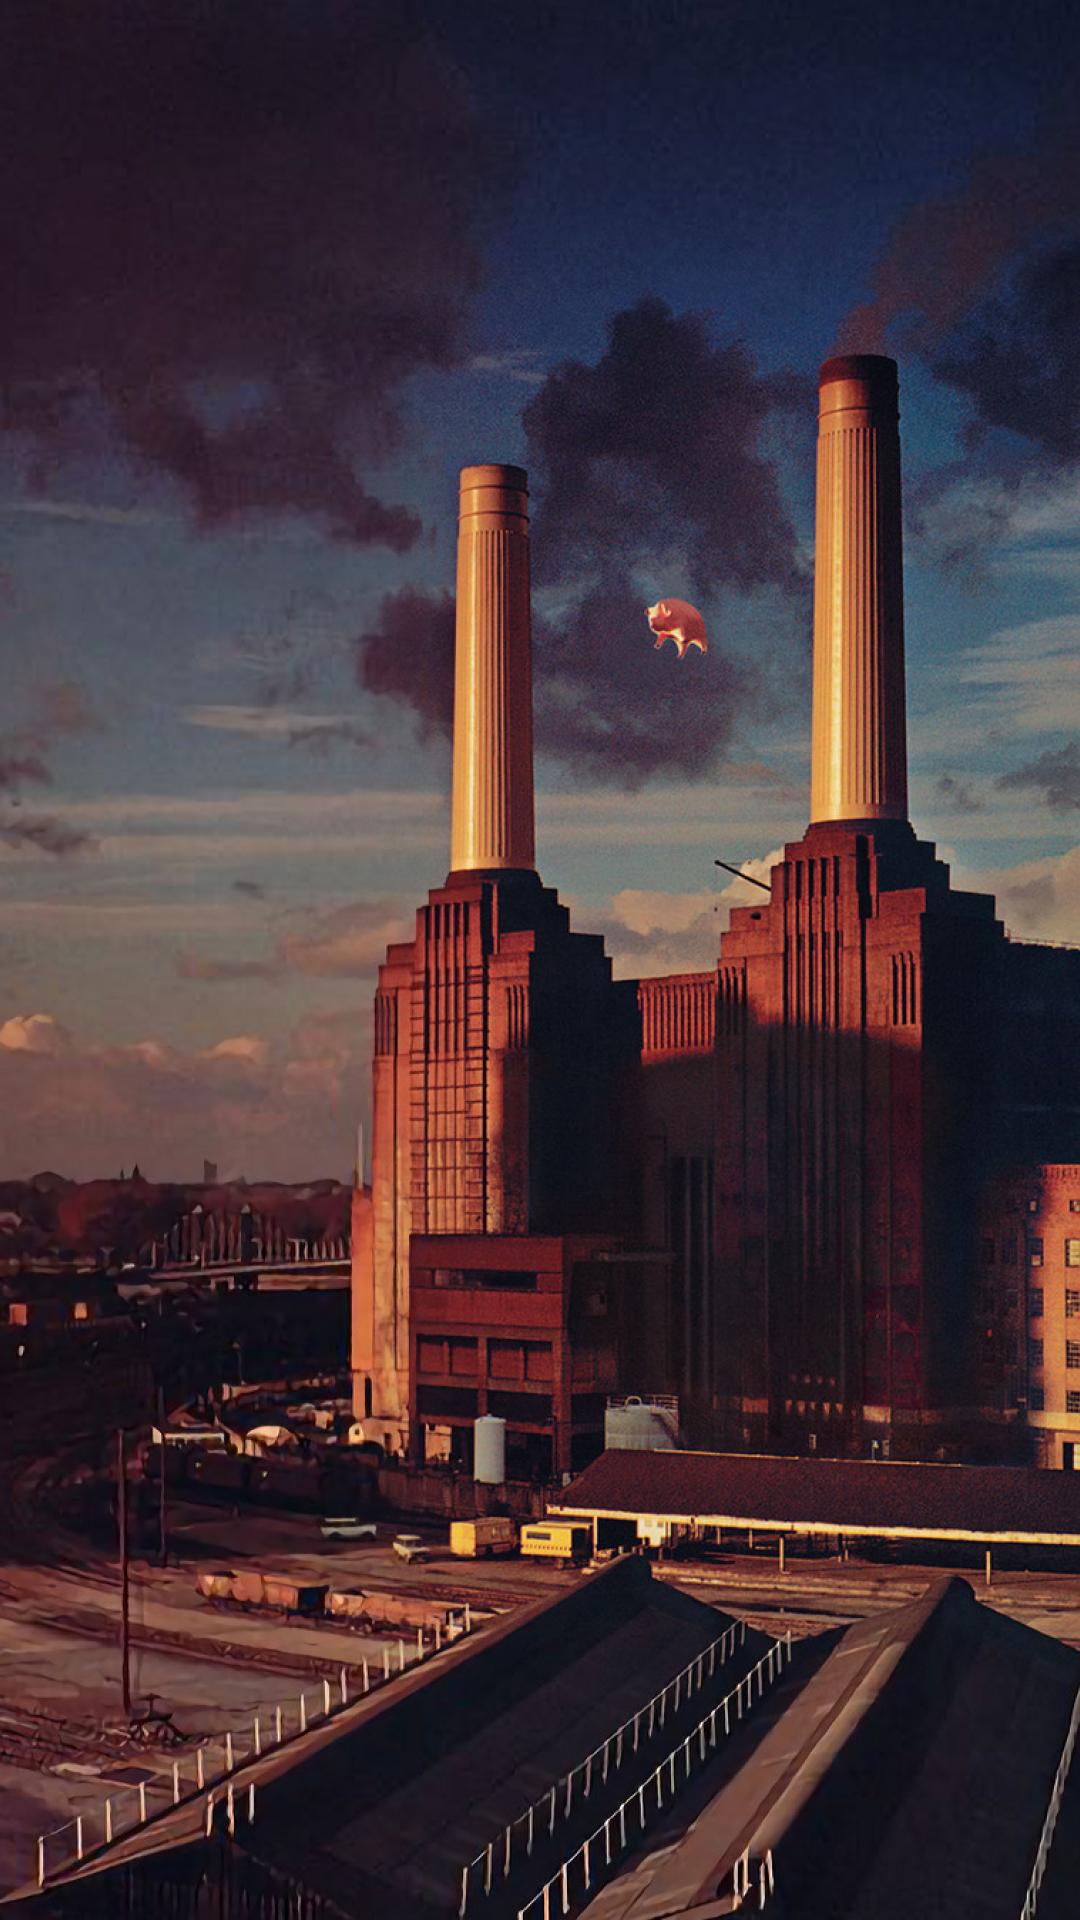 1080x1920 Pink Floyd Animals Album Cover Iphone 7 6s 6 Plus And